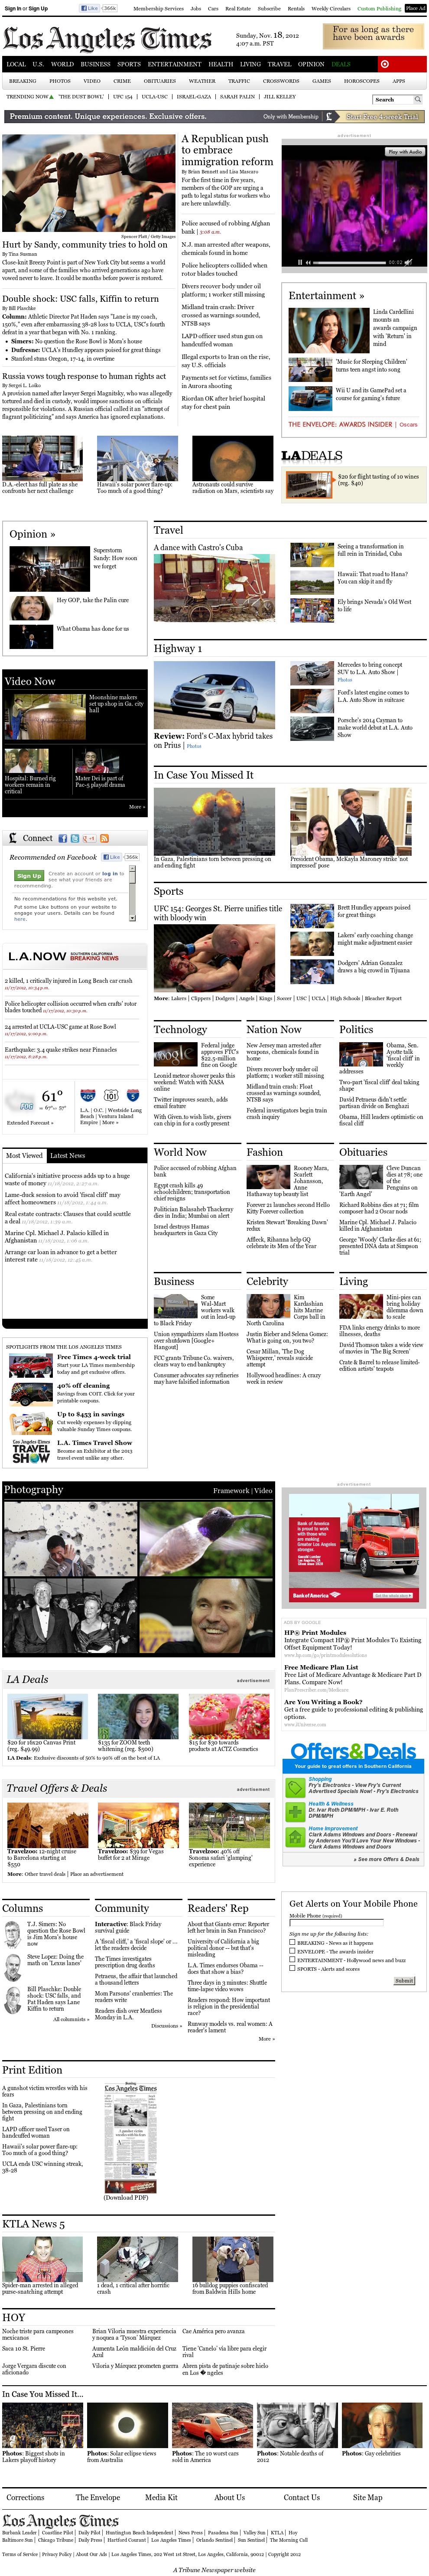 Los Angeles Times at Sunday Nov. 18, 2012, 12:14 p.m. UTC